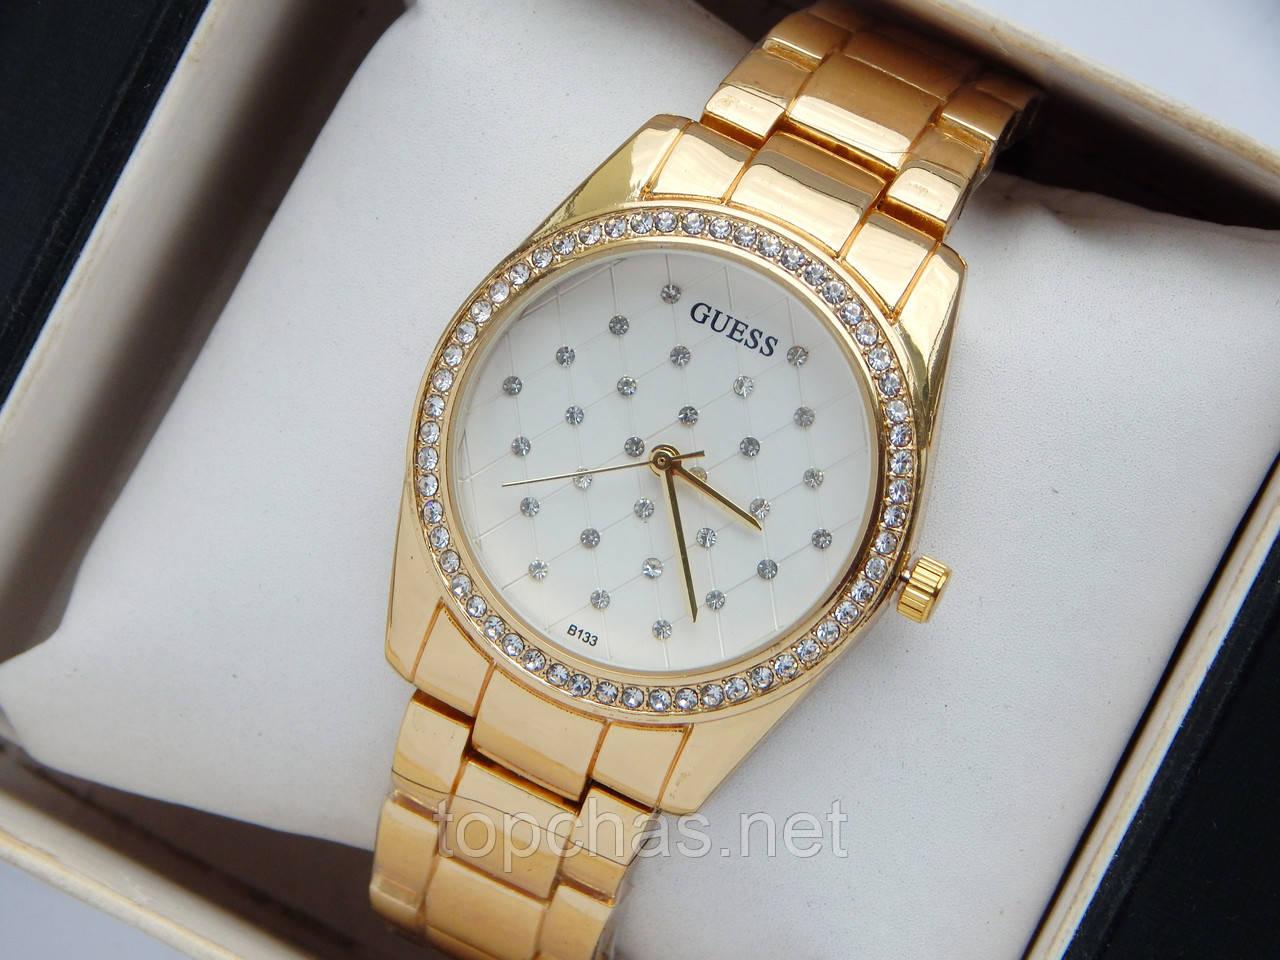 5ab75053 Женские кварцевые наручные часы Guess b133, сетка из страз - Top Chas -  Интернет магазин